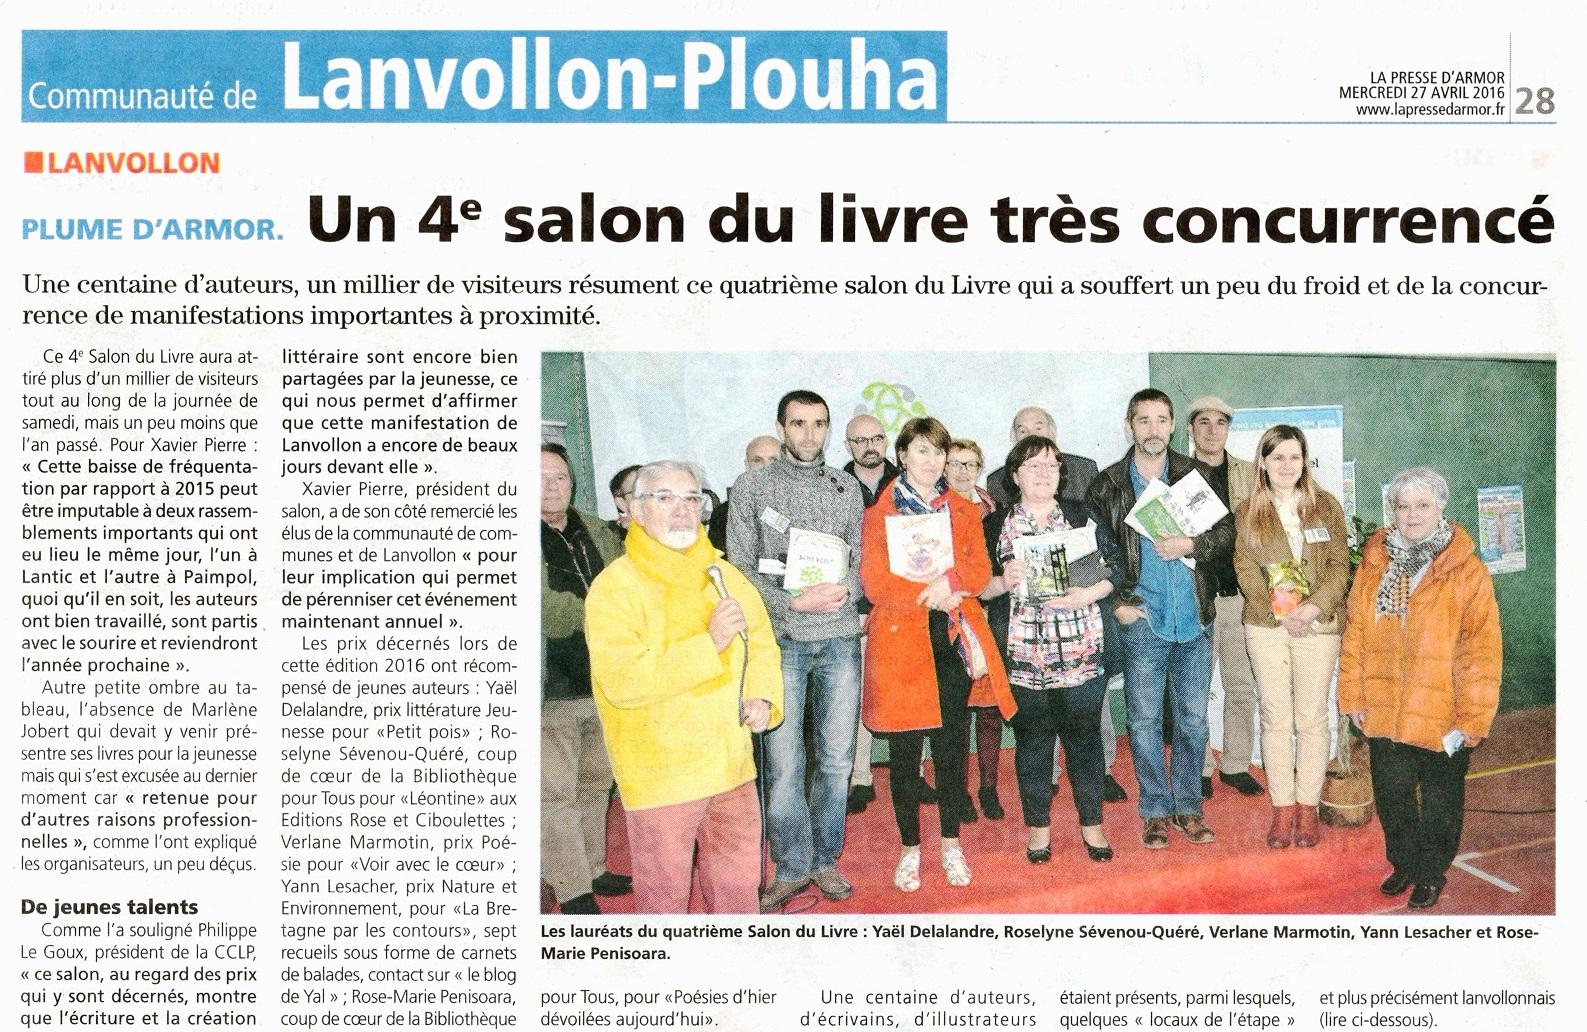 2016 04 27 presse d armor prix salon lanvollonr